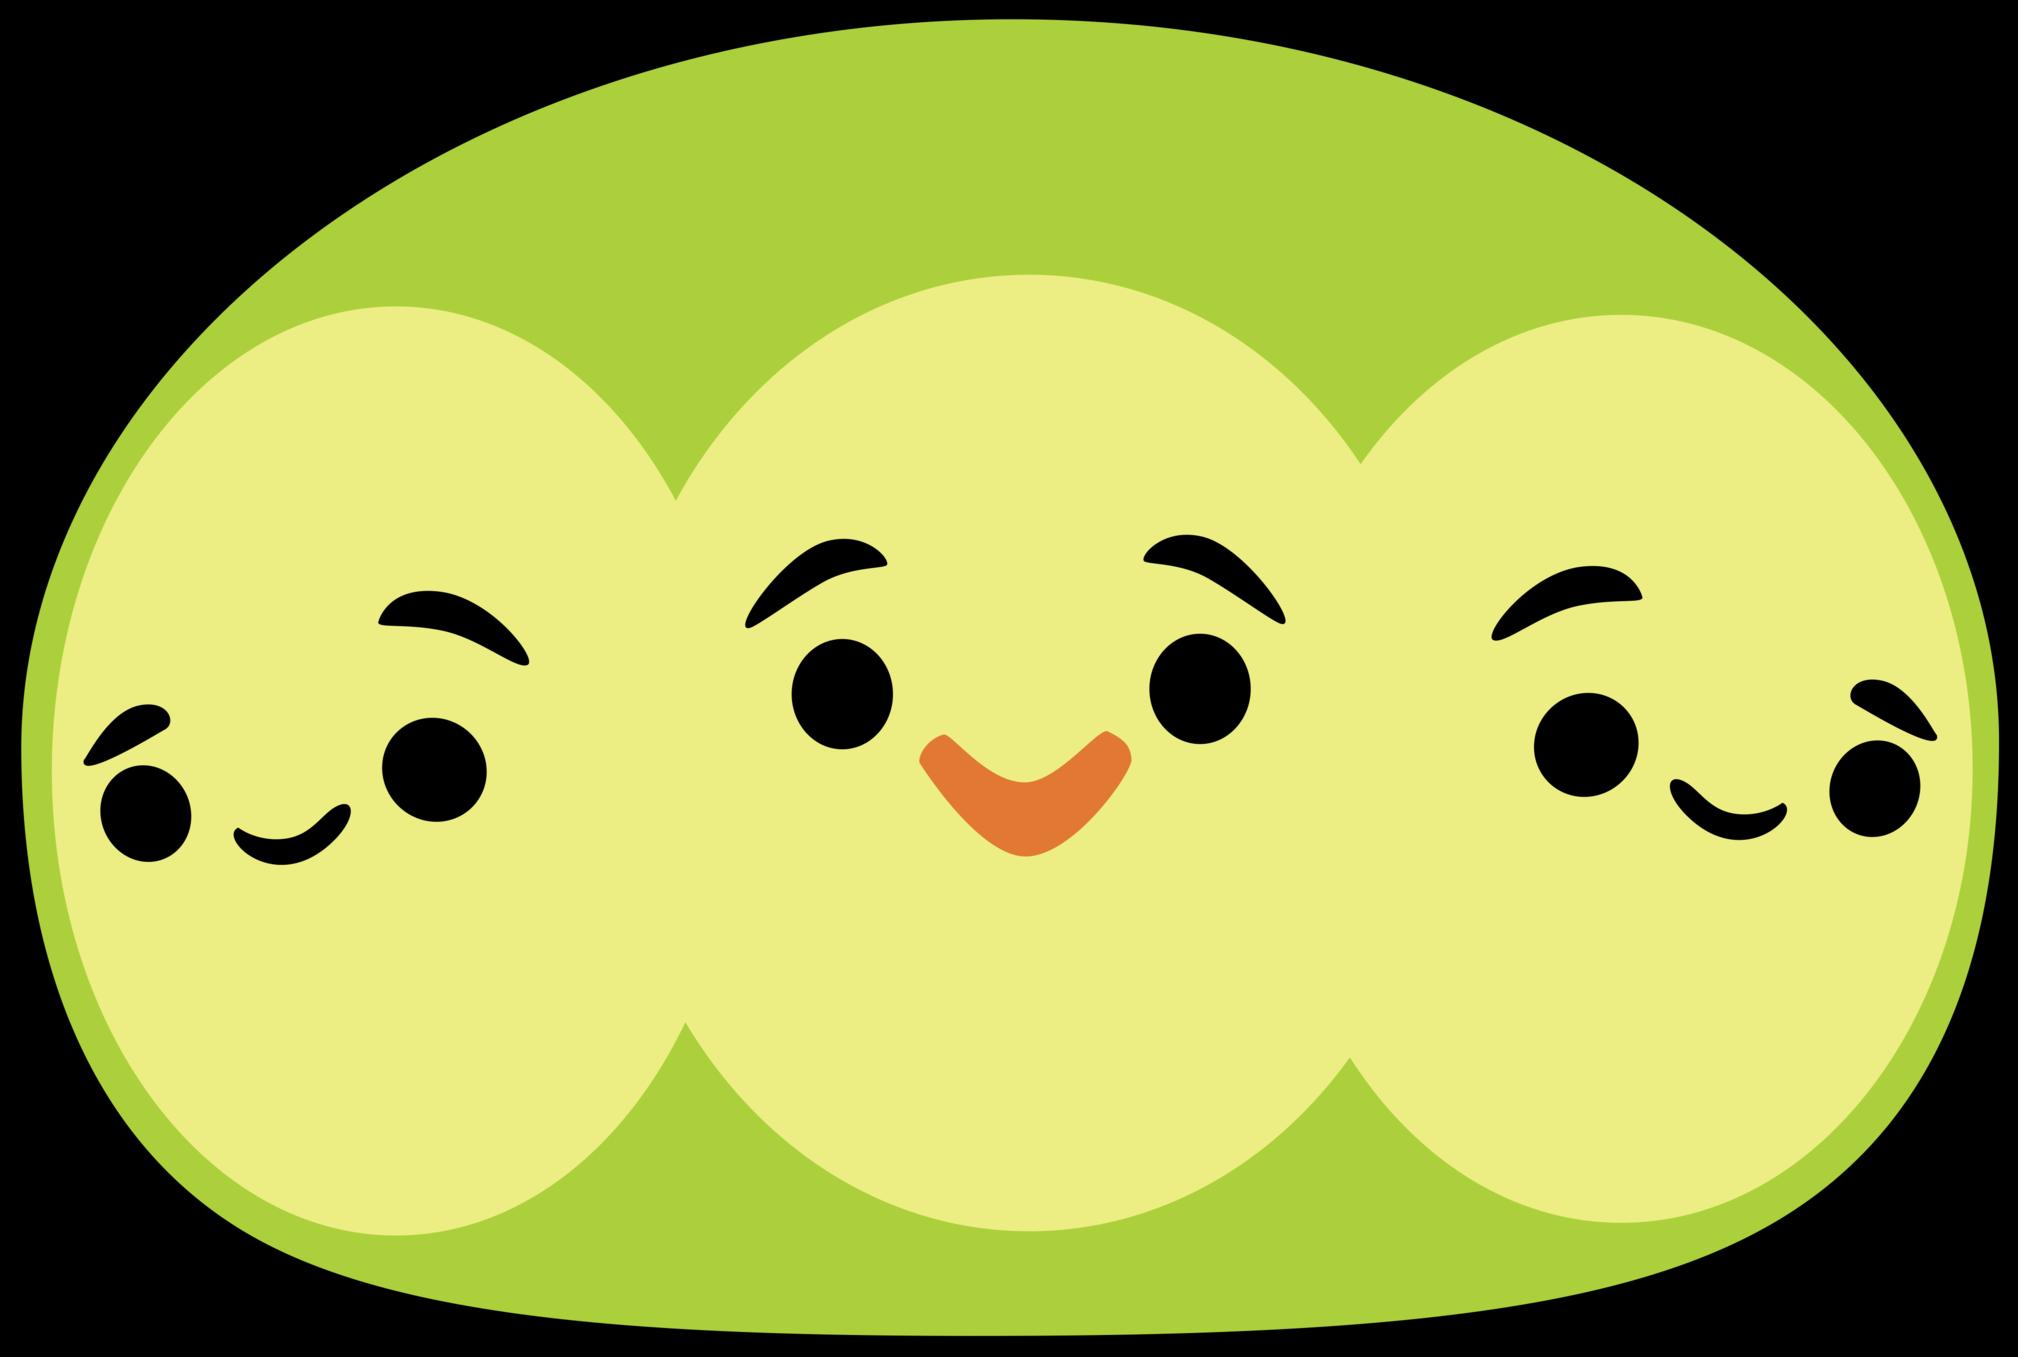 Disney Tsum Tsum Clipart 9: Disney Tsum Tsum Png 53